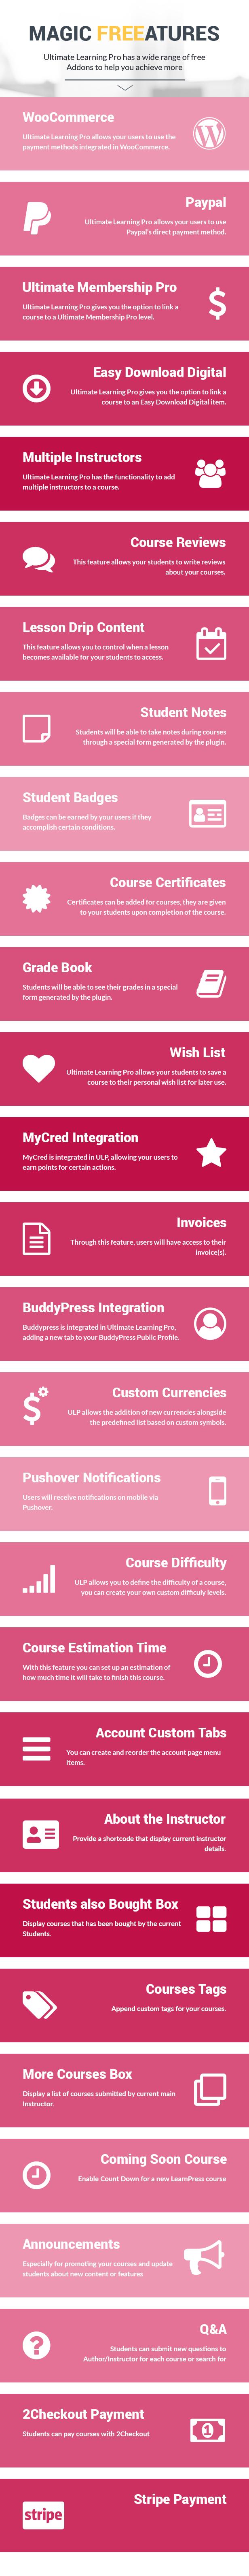 - 12 magic feature list1 - Ultimate Learning Pro WordPress Plugin